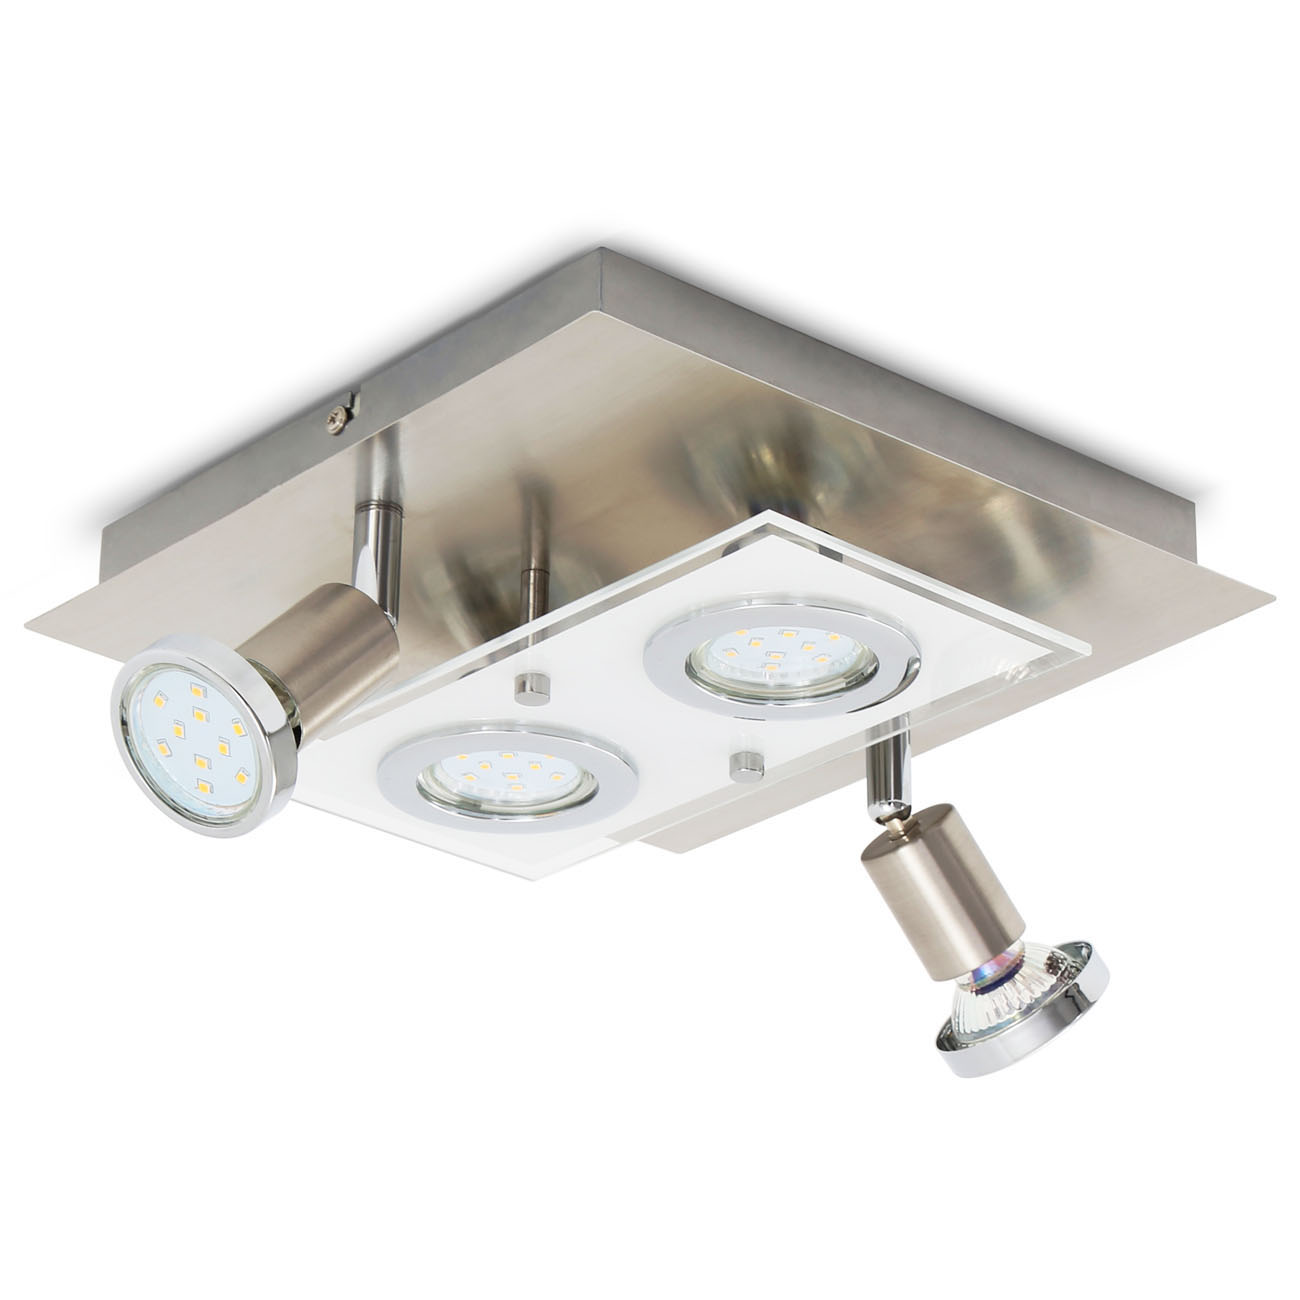 LED Kombi Deckenleuchte Spotleuchte 4-flammig  - 1